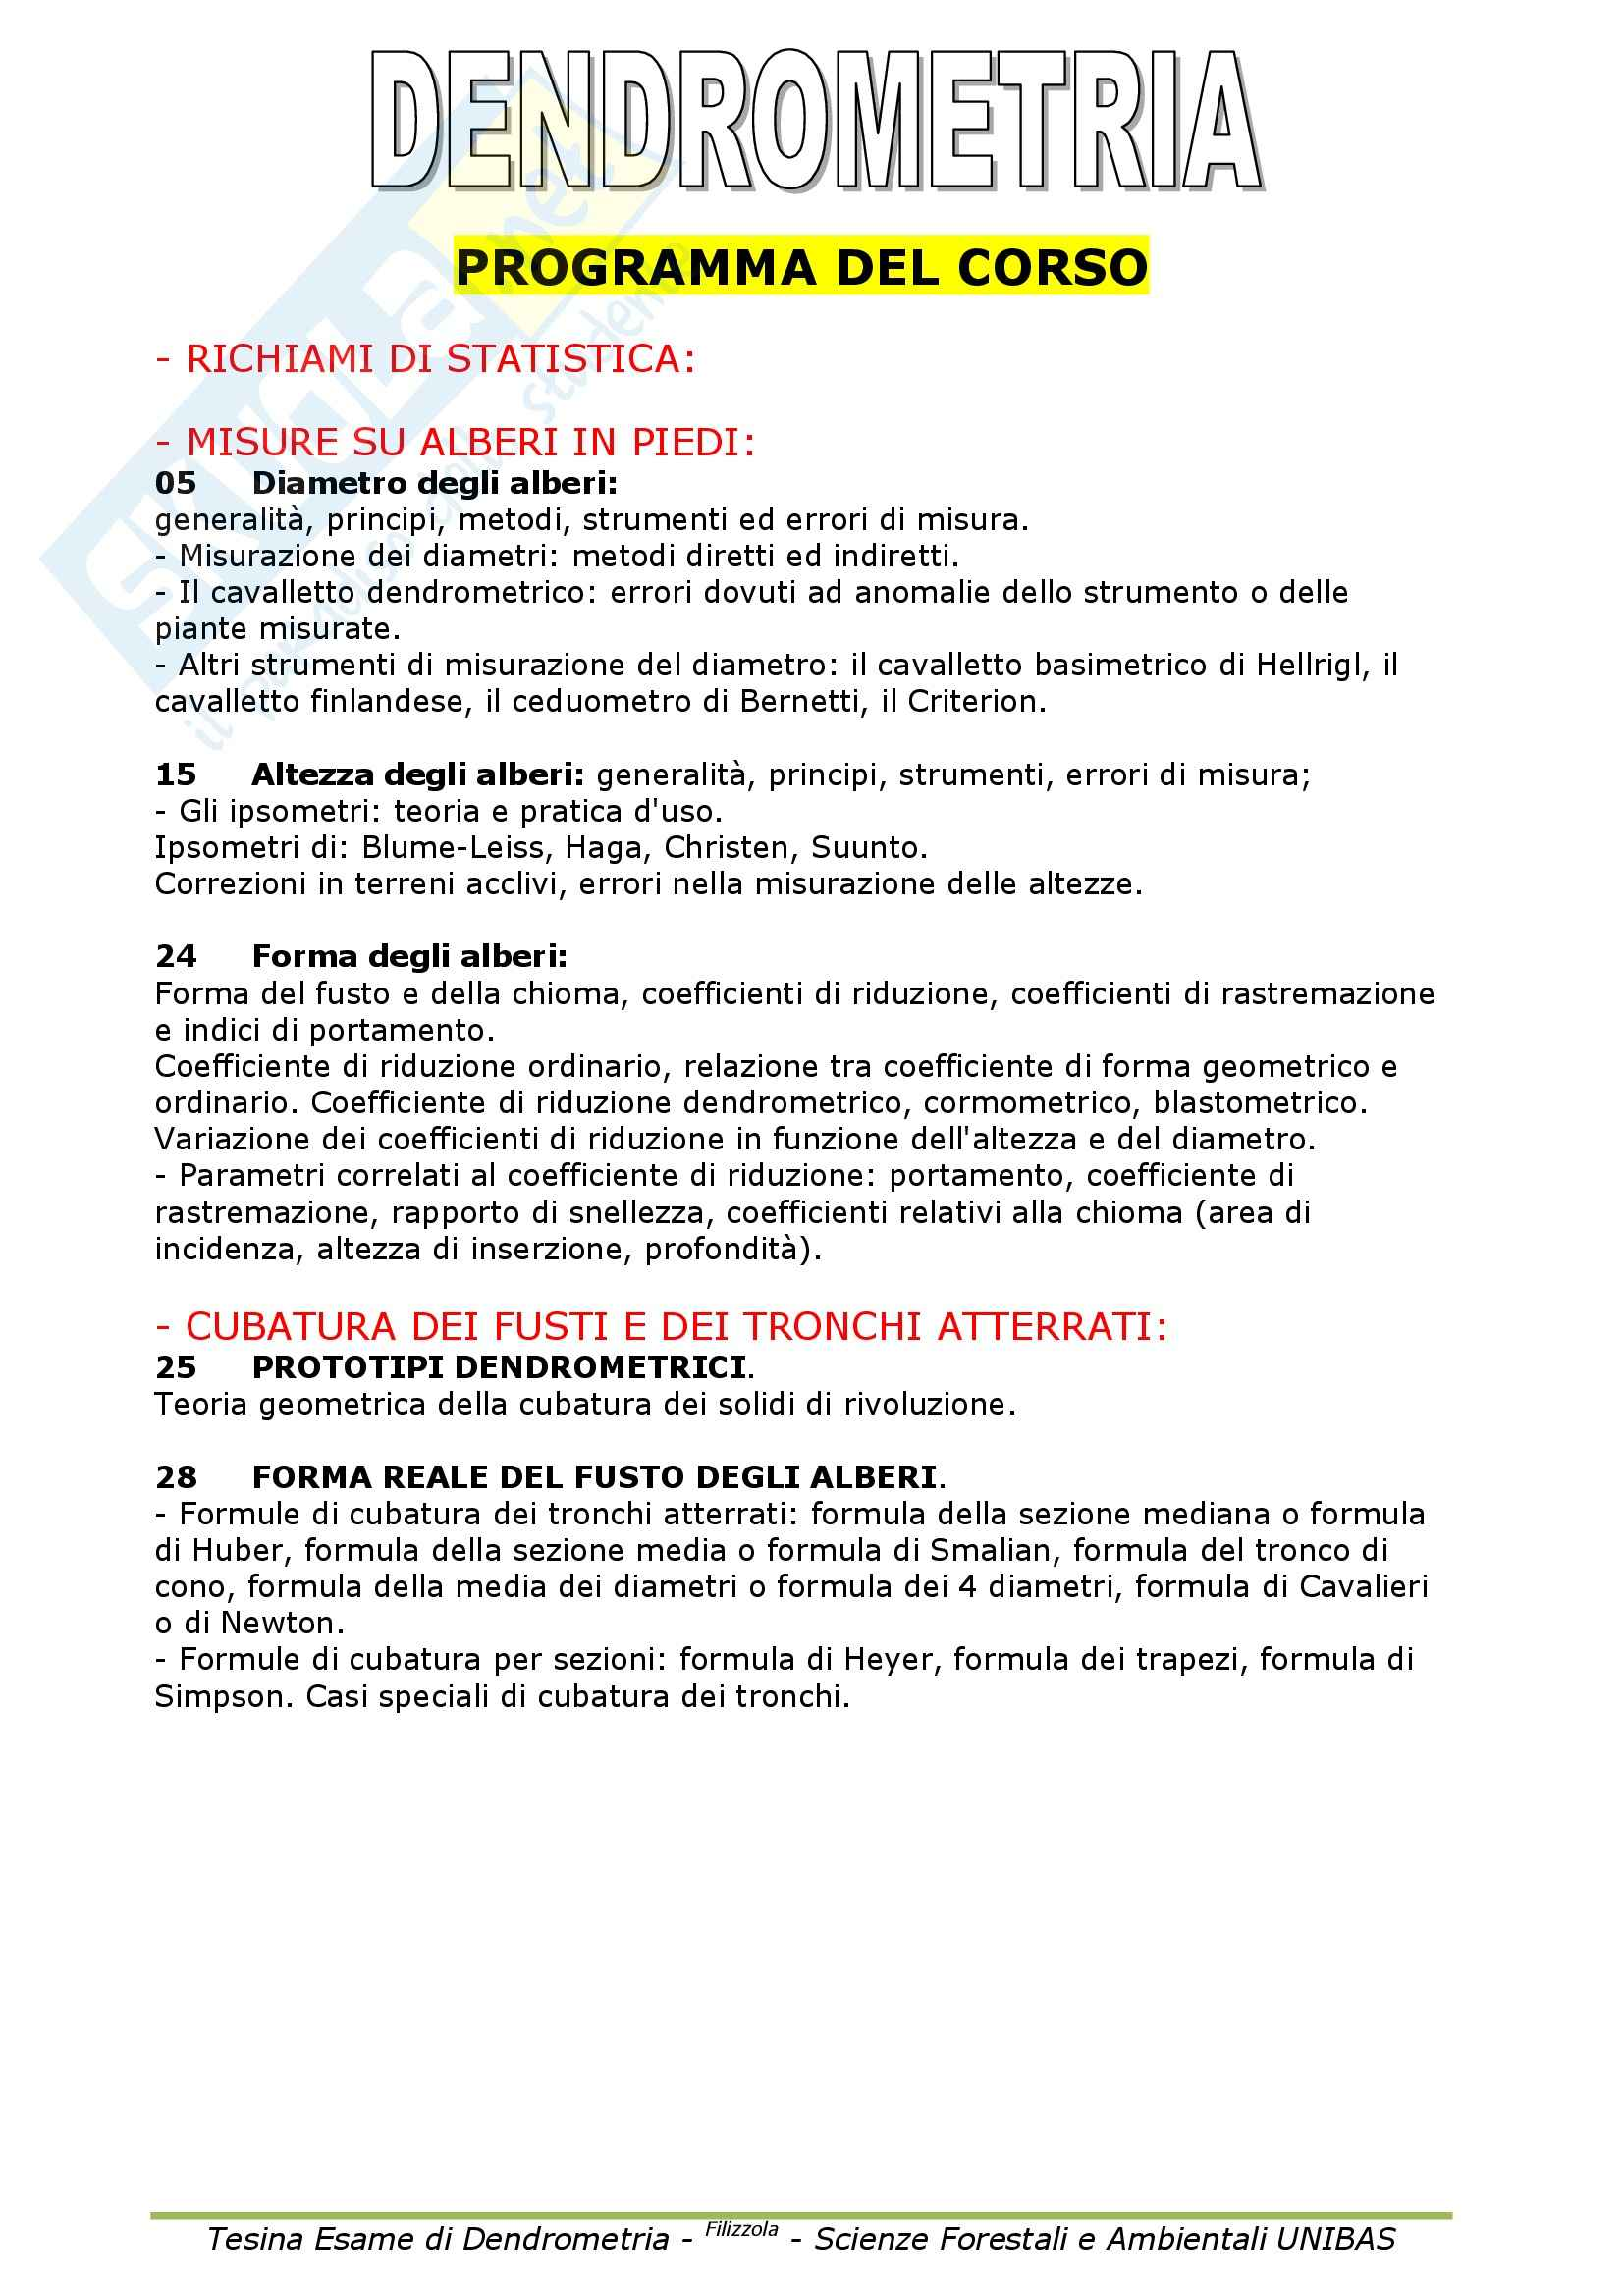 appunto D. Totaro Dendrometria